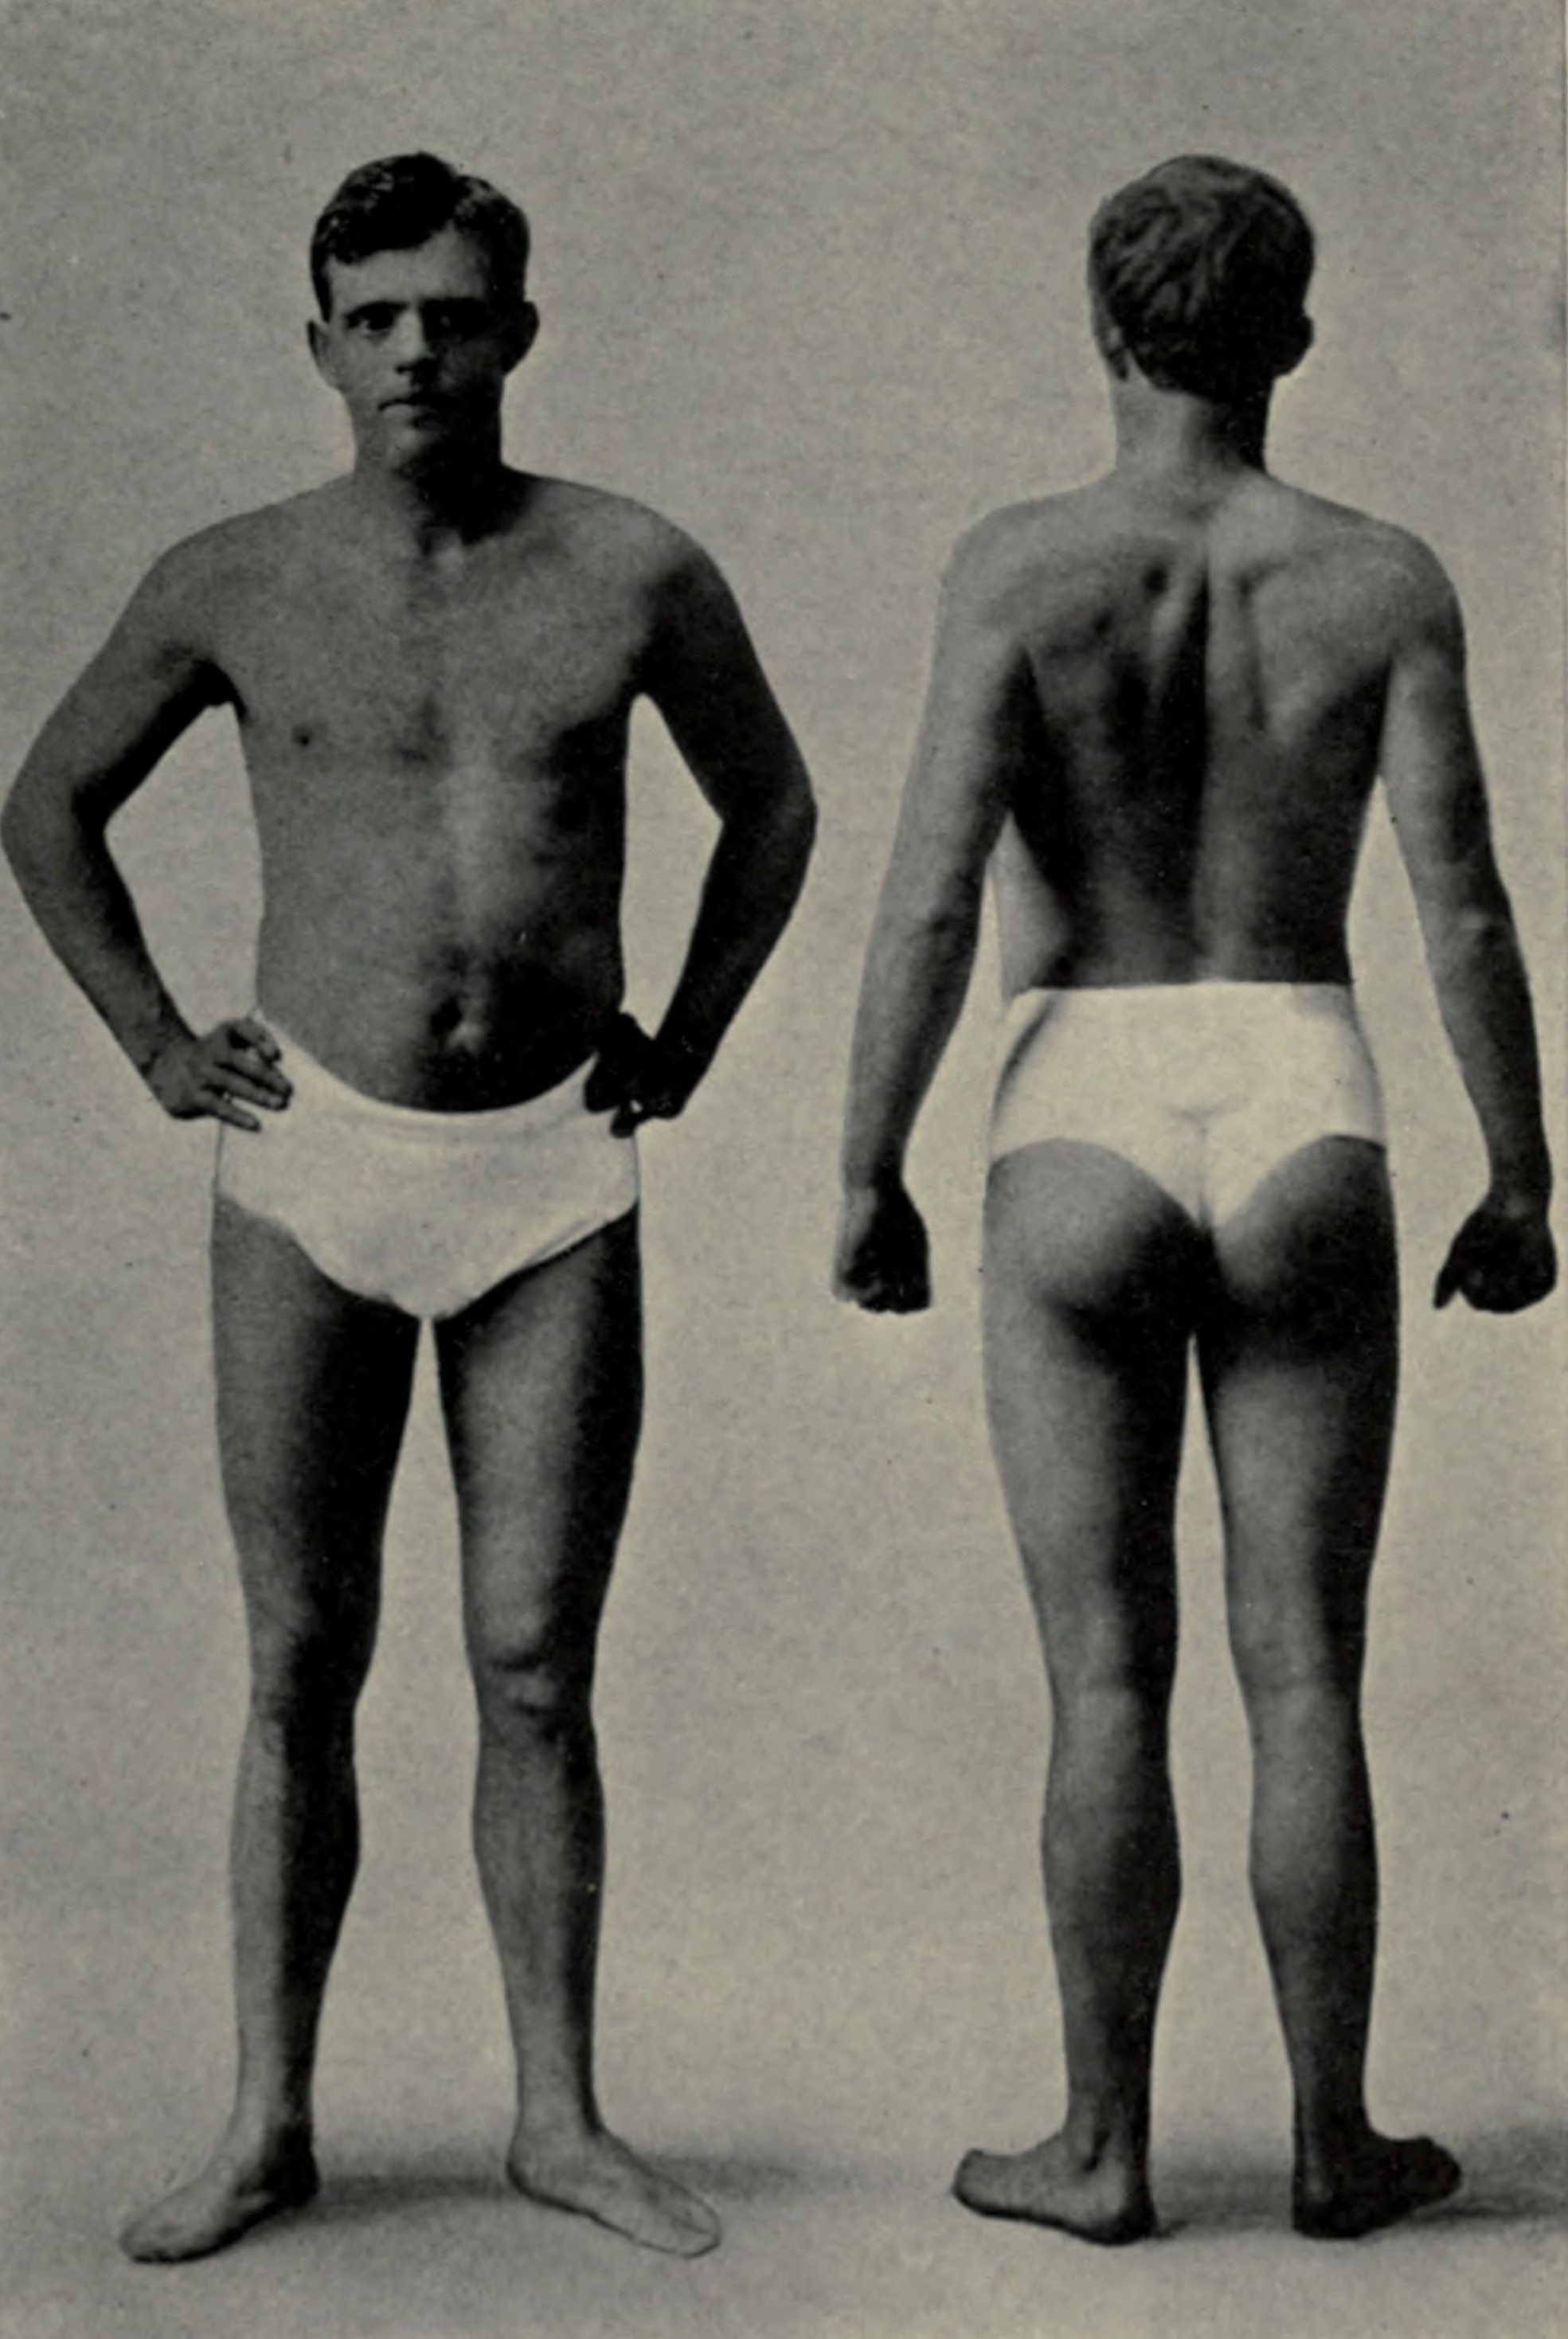 File:Jack London 1904.jpg - Wikimedia Commons